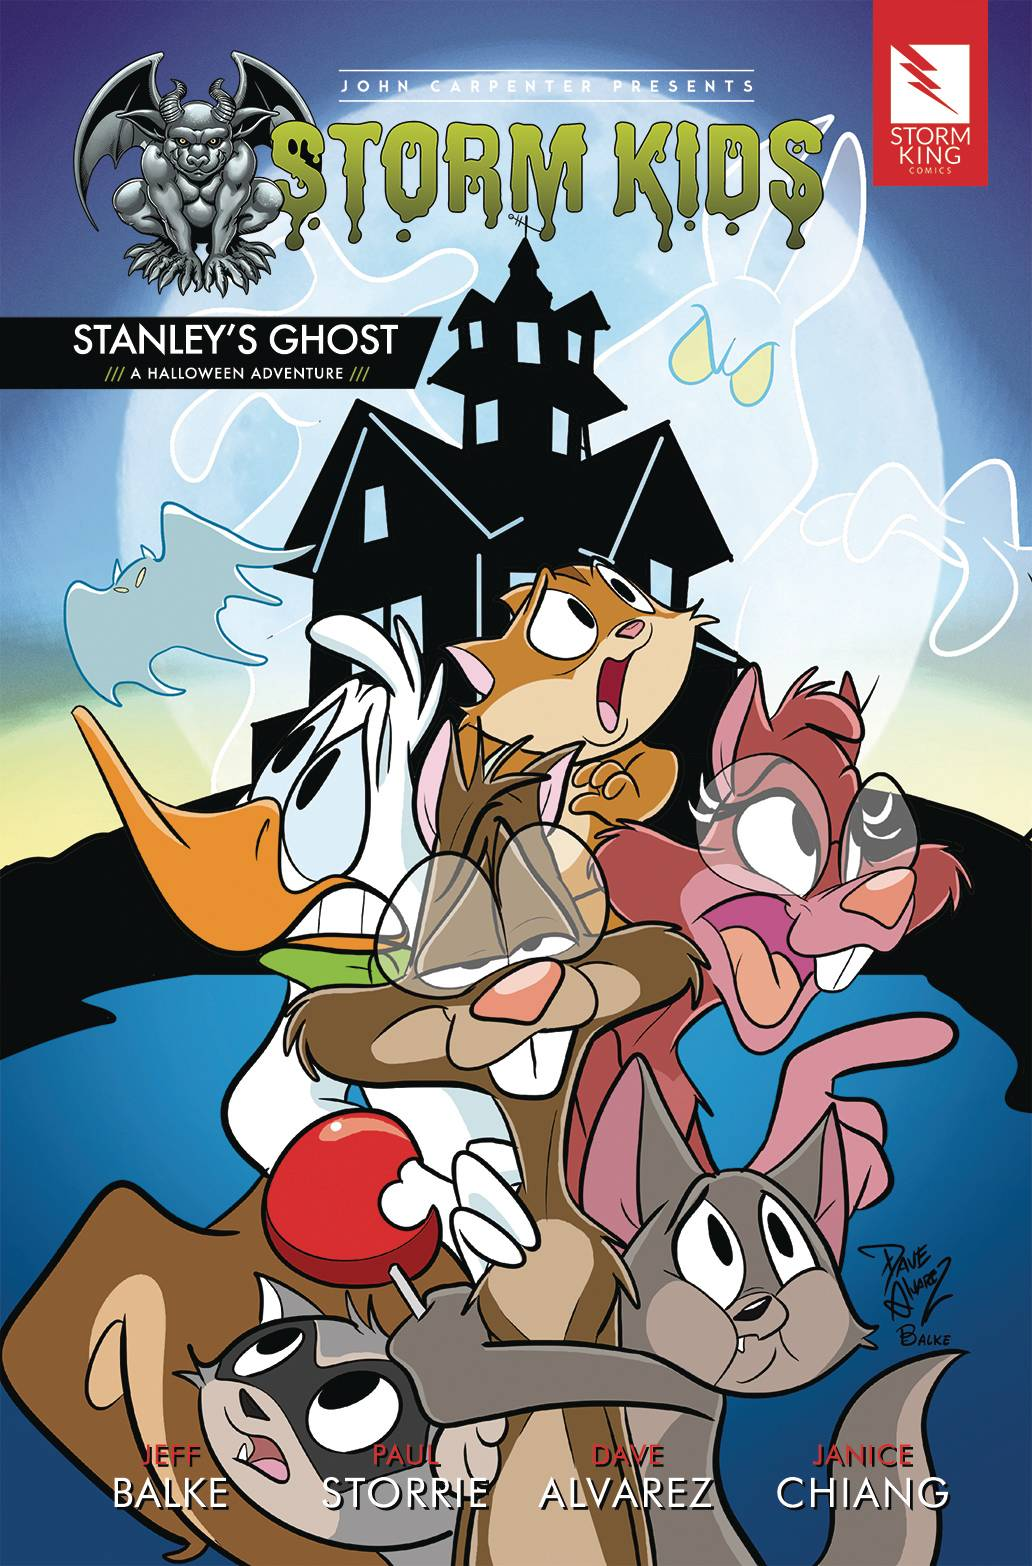 John Carpenter Presents Storm Kids: Stanley's Ghost #1 (2020)